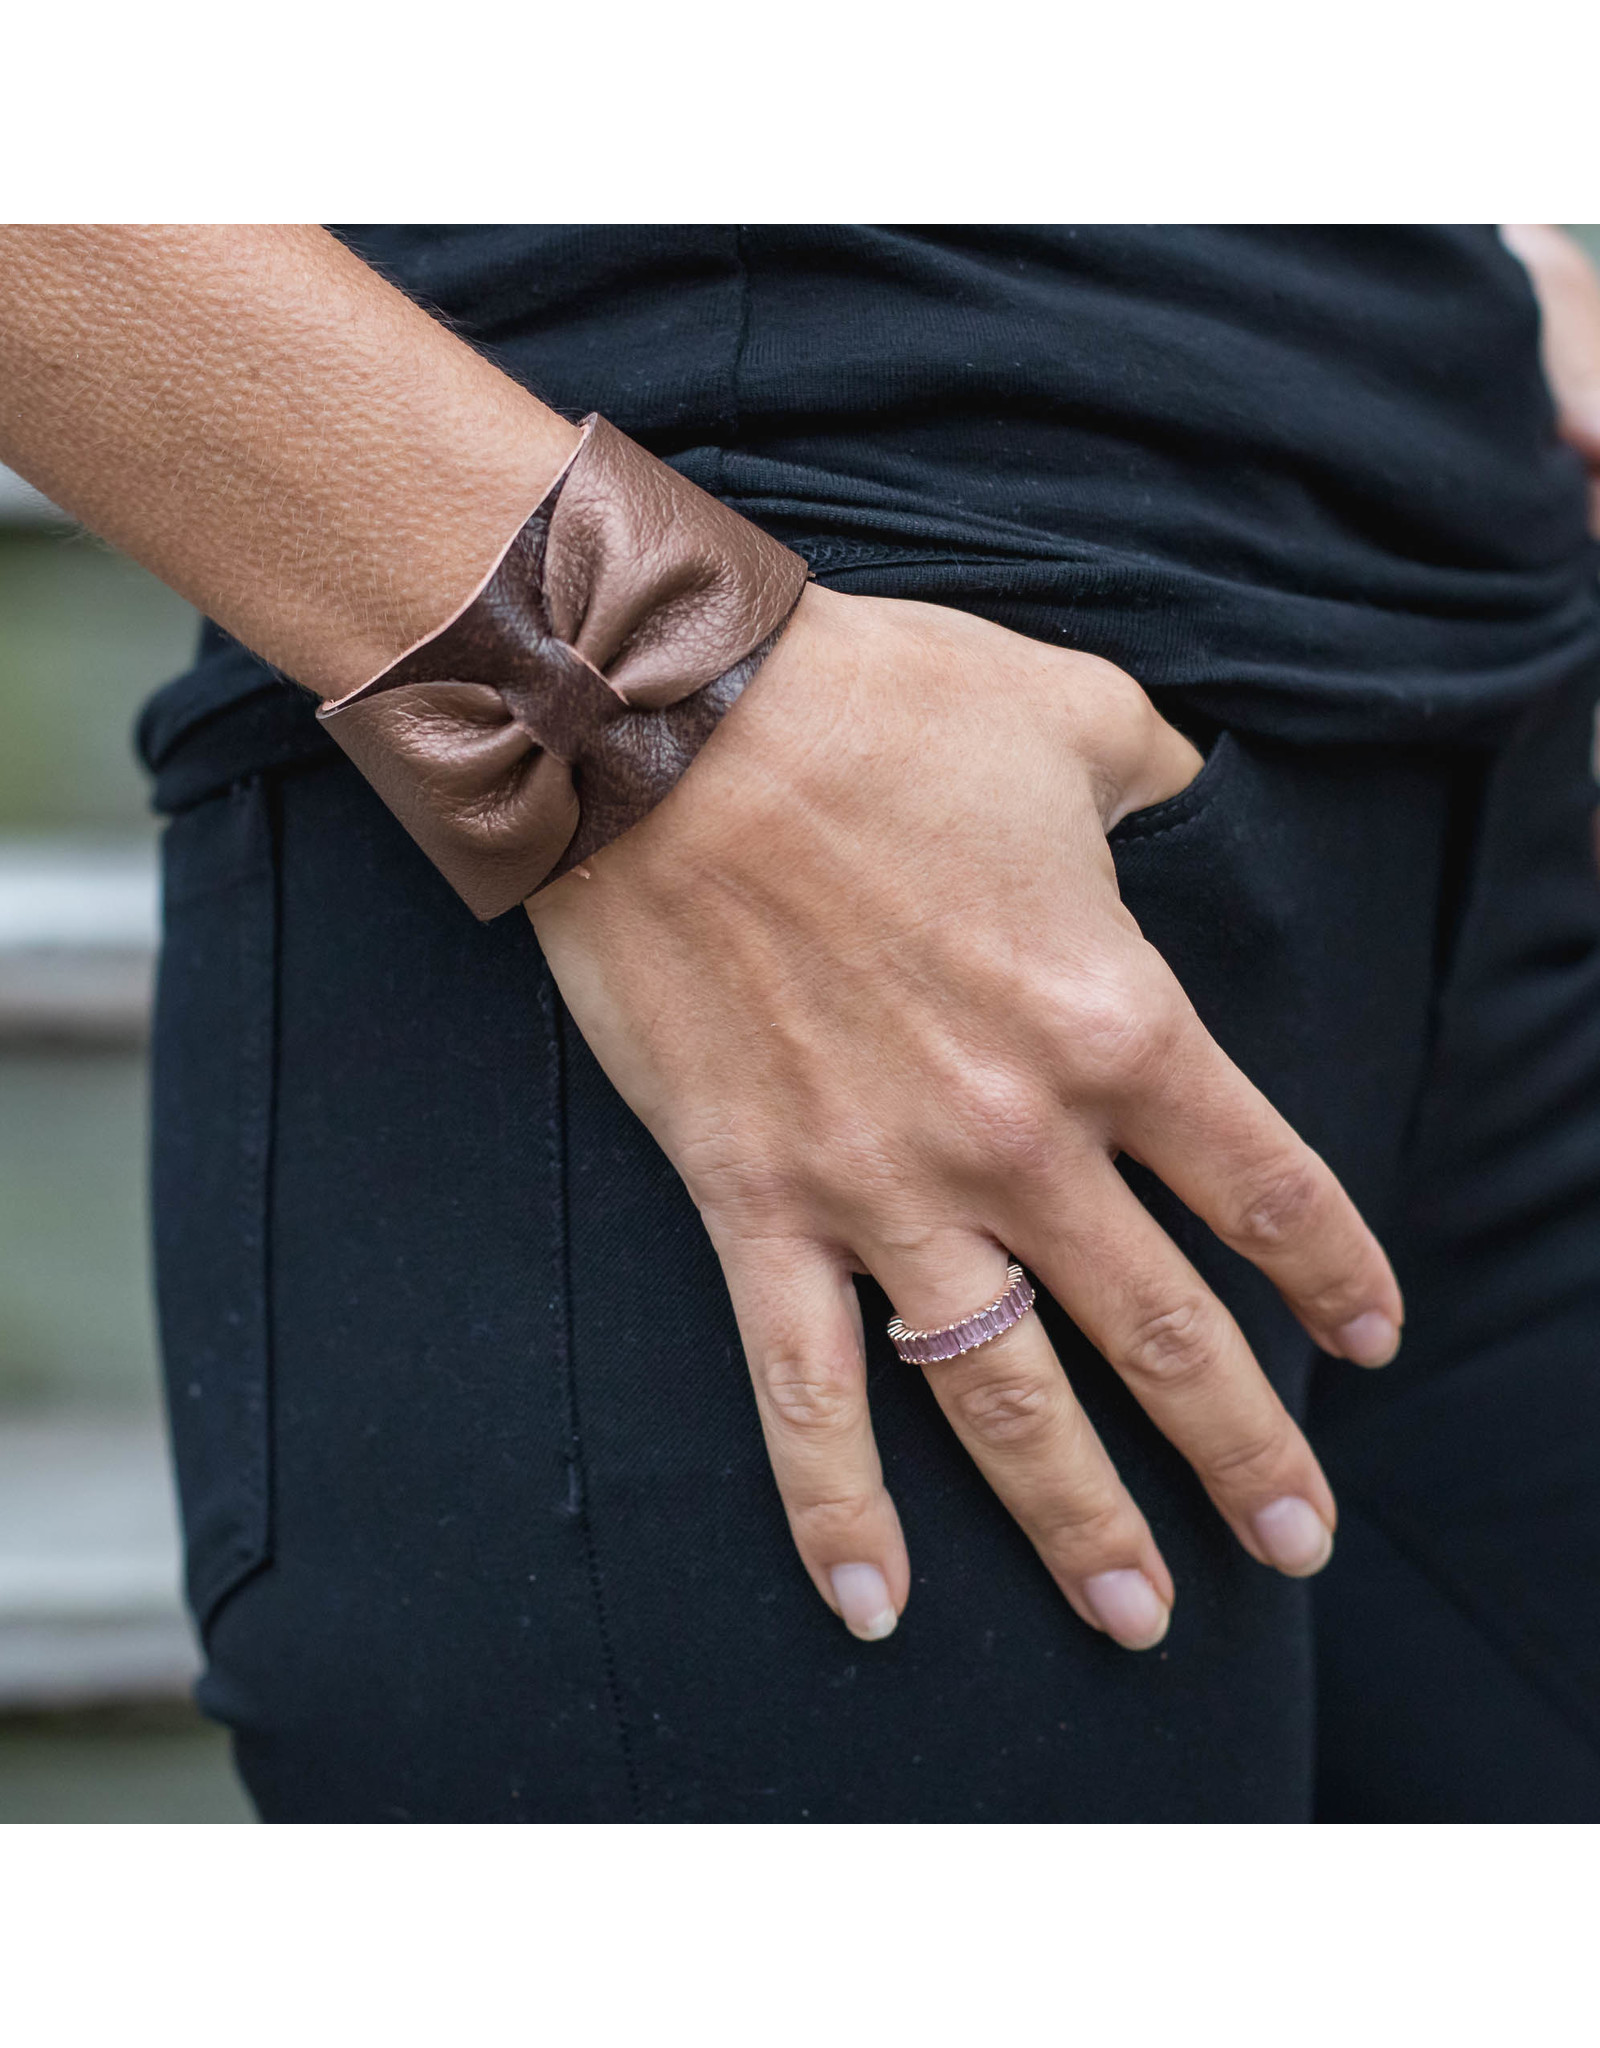 The Shalom Bracelet